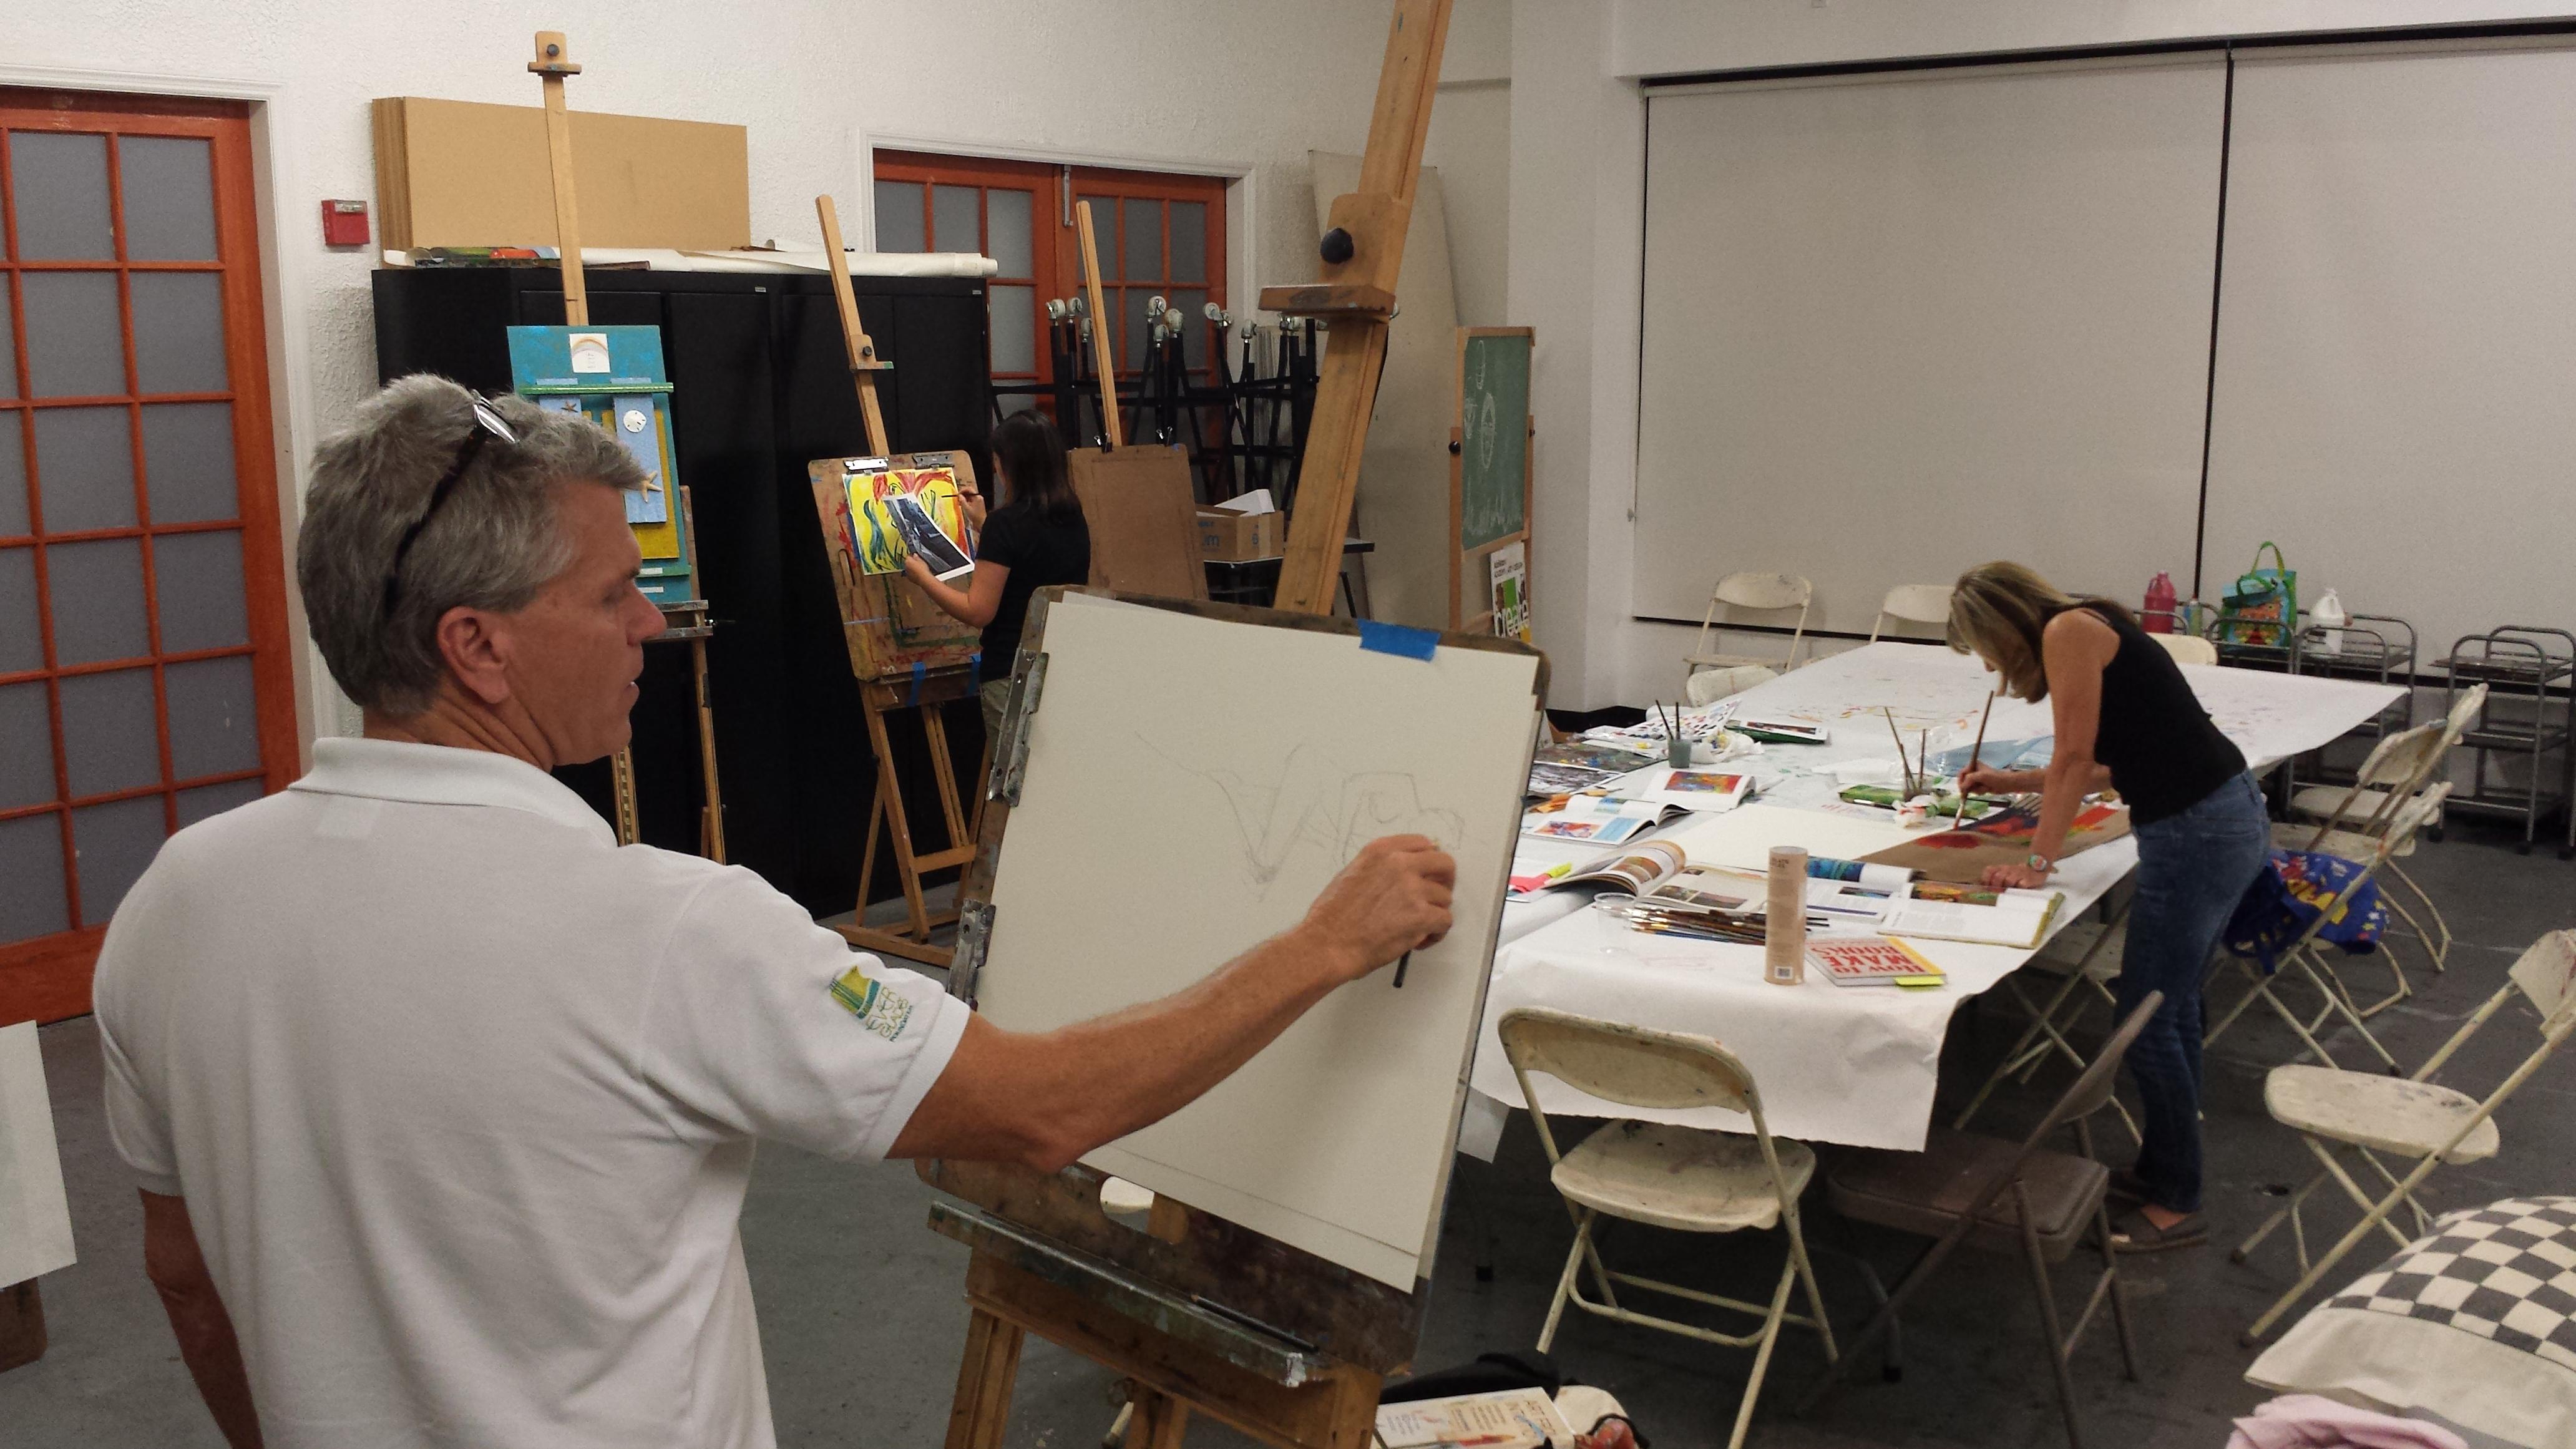 Adult Art Classes in Fort Lauderdale - NSU Art Museum